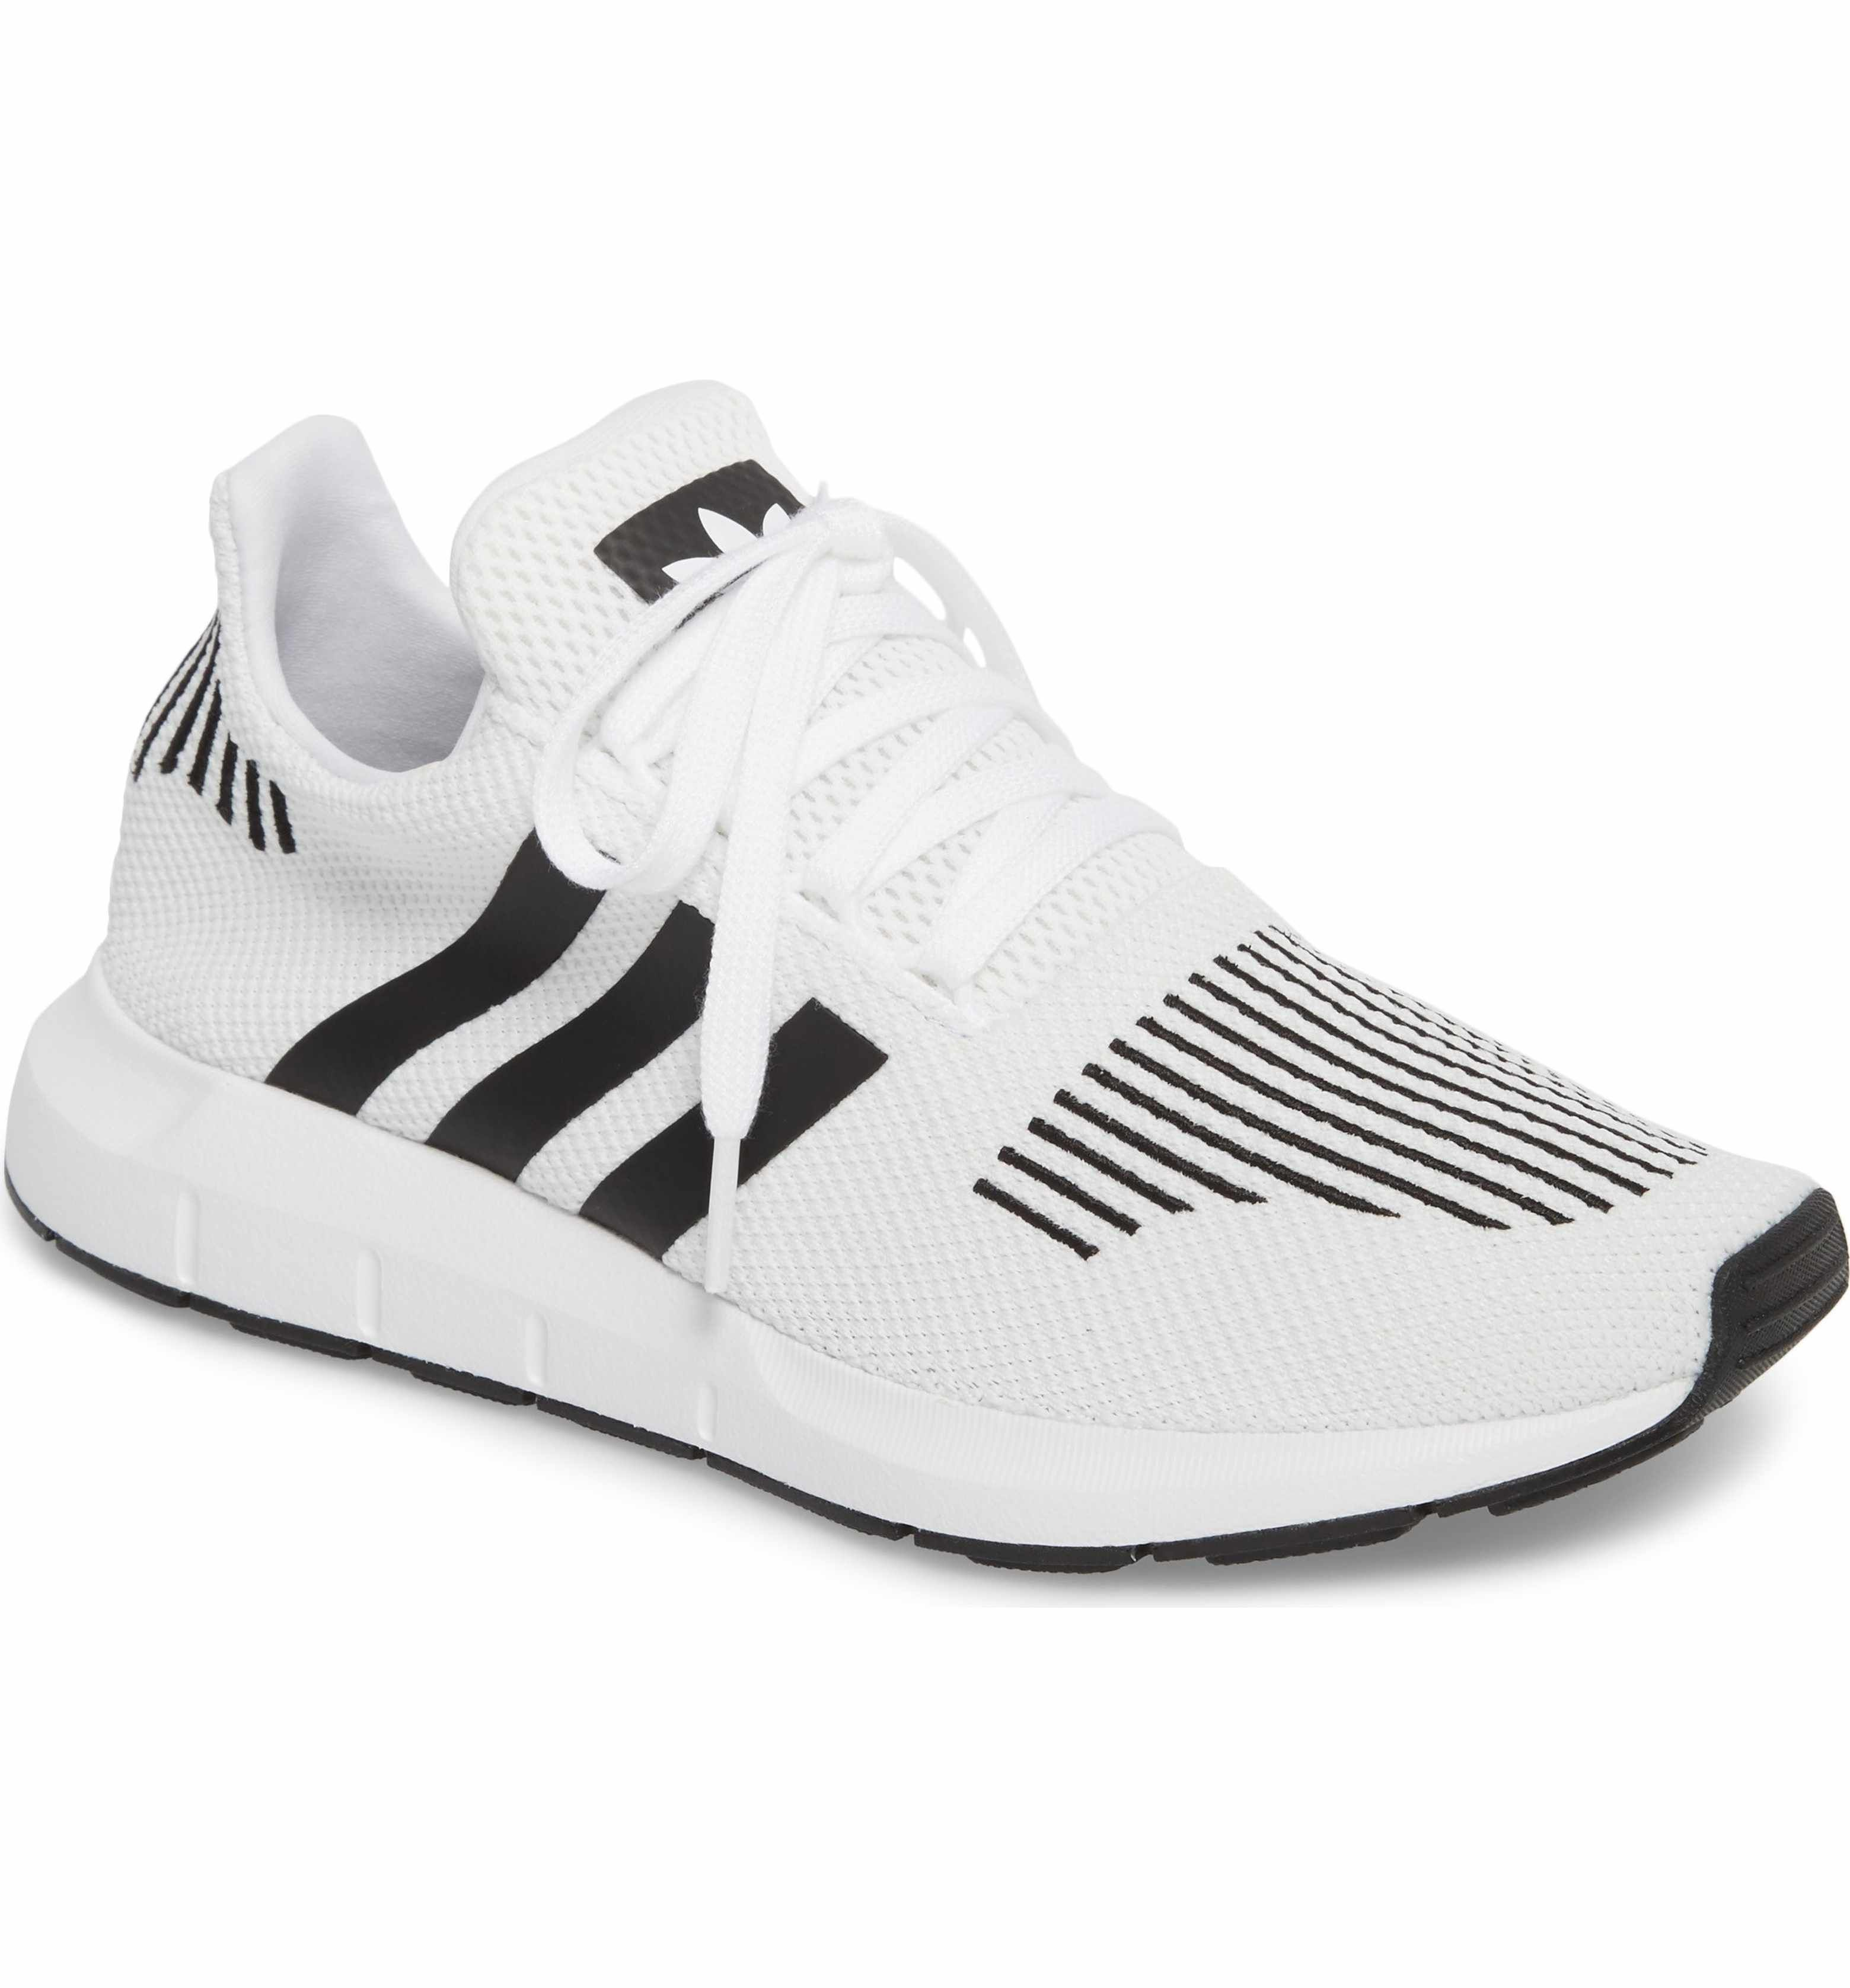 immagine principale adidas swift run scarpa (donne) moda pinterest